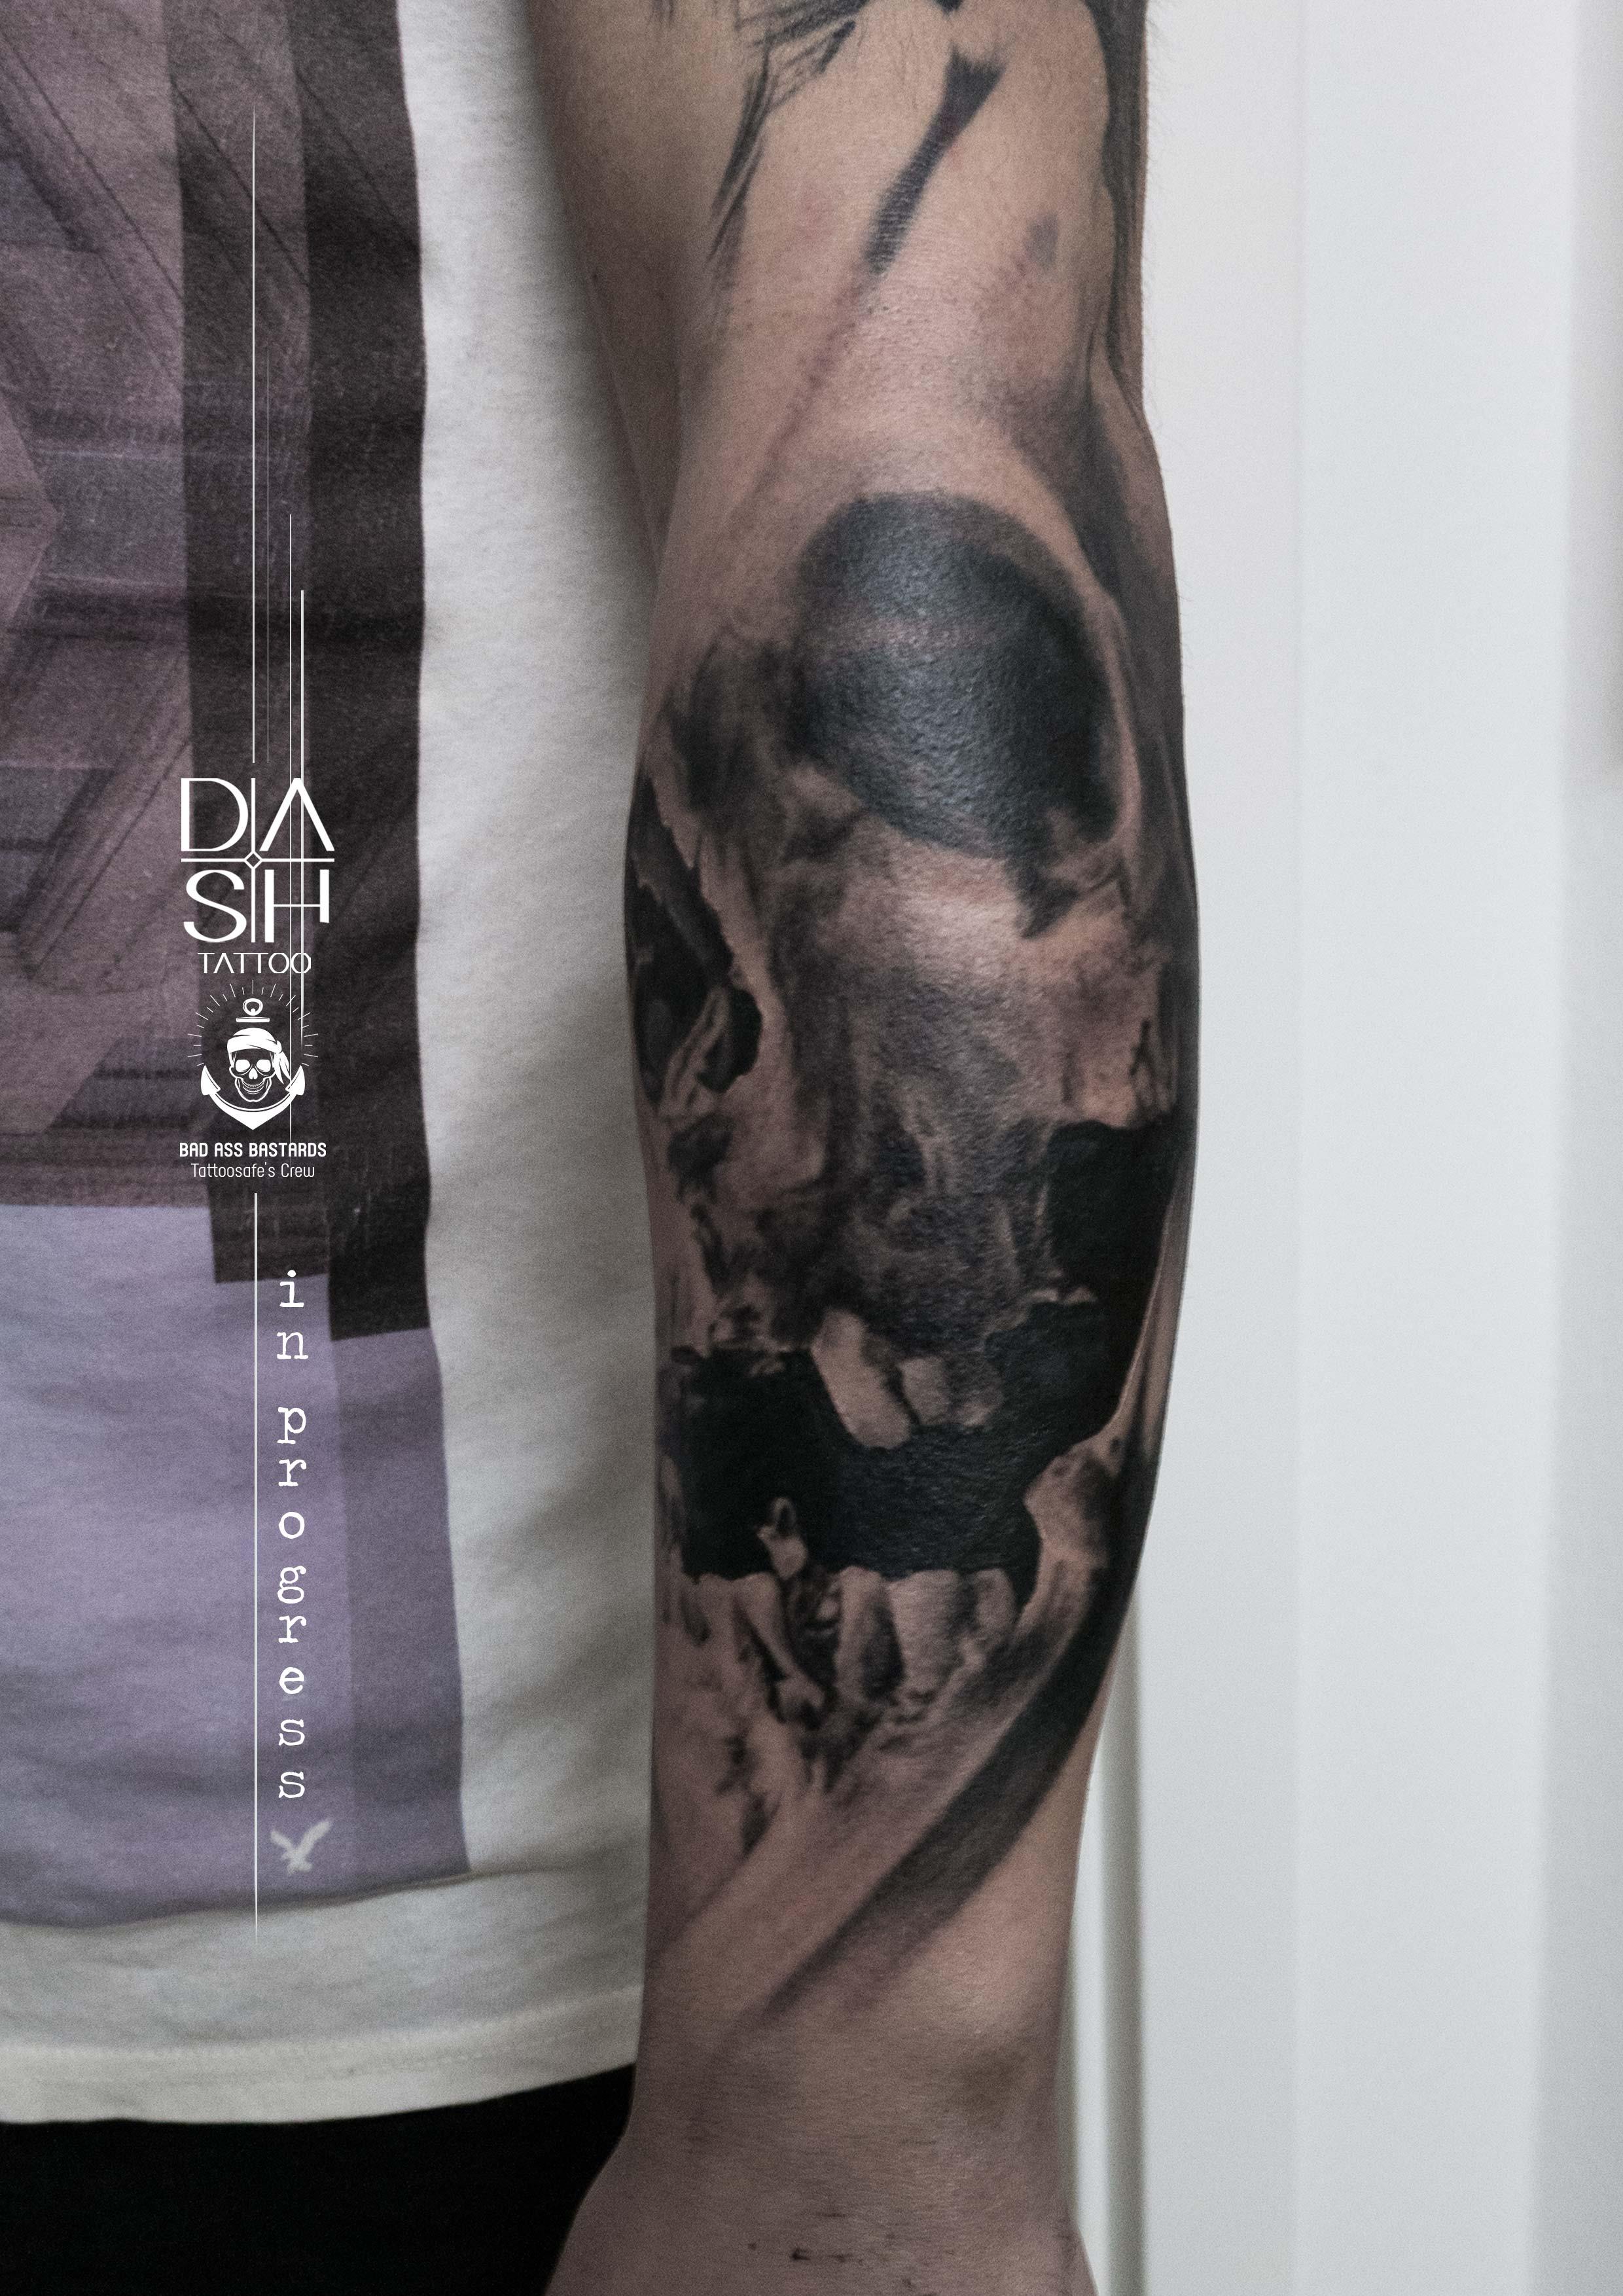 DASH ABOUT + Danny ShoeStar + Artist + Biography + Artwork